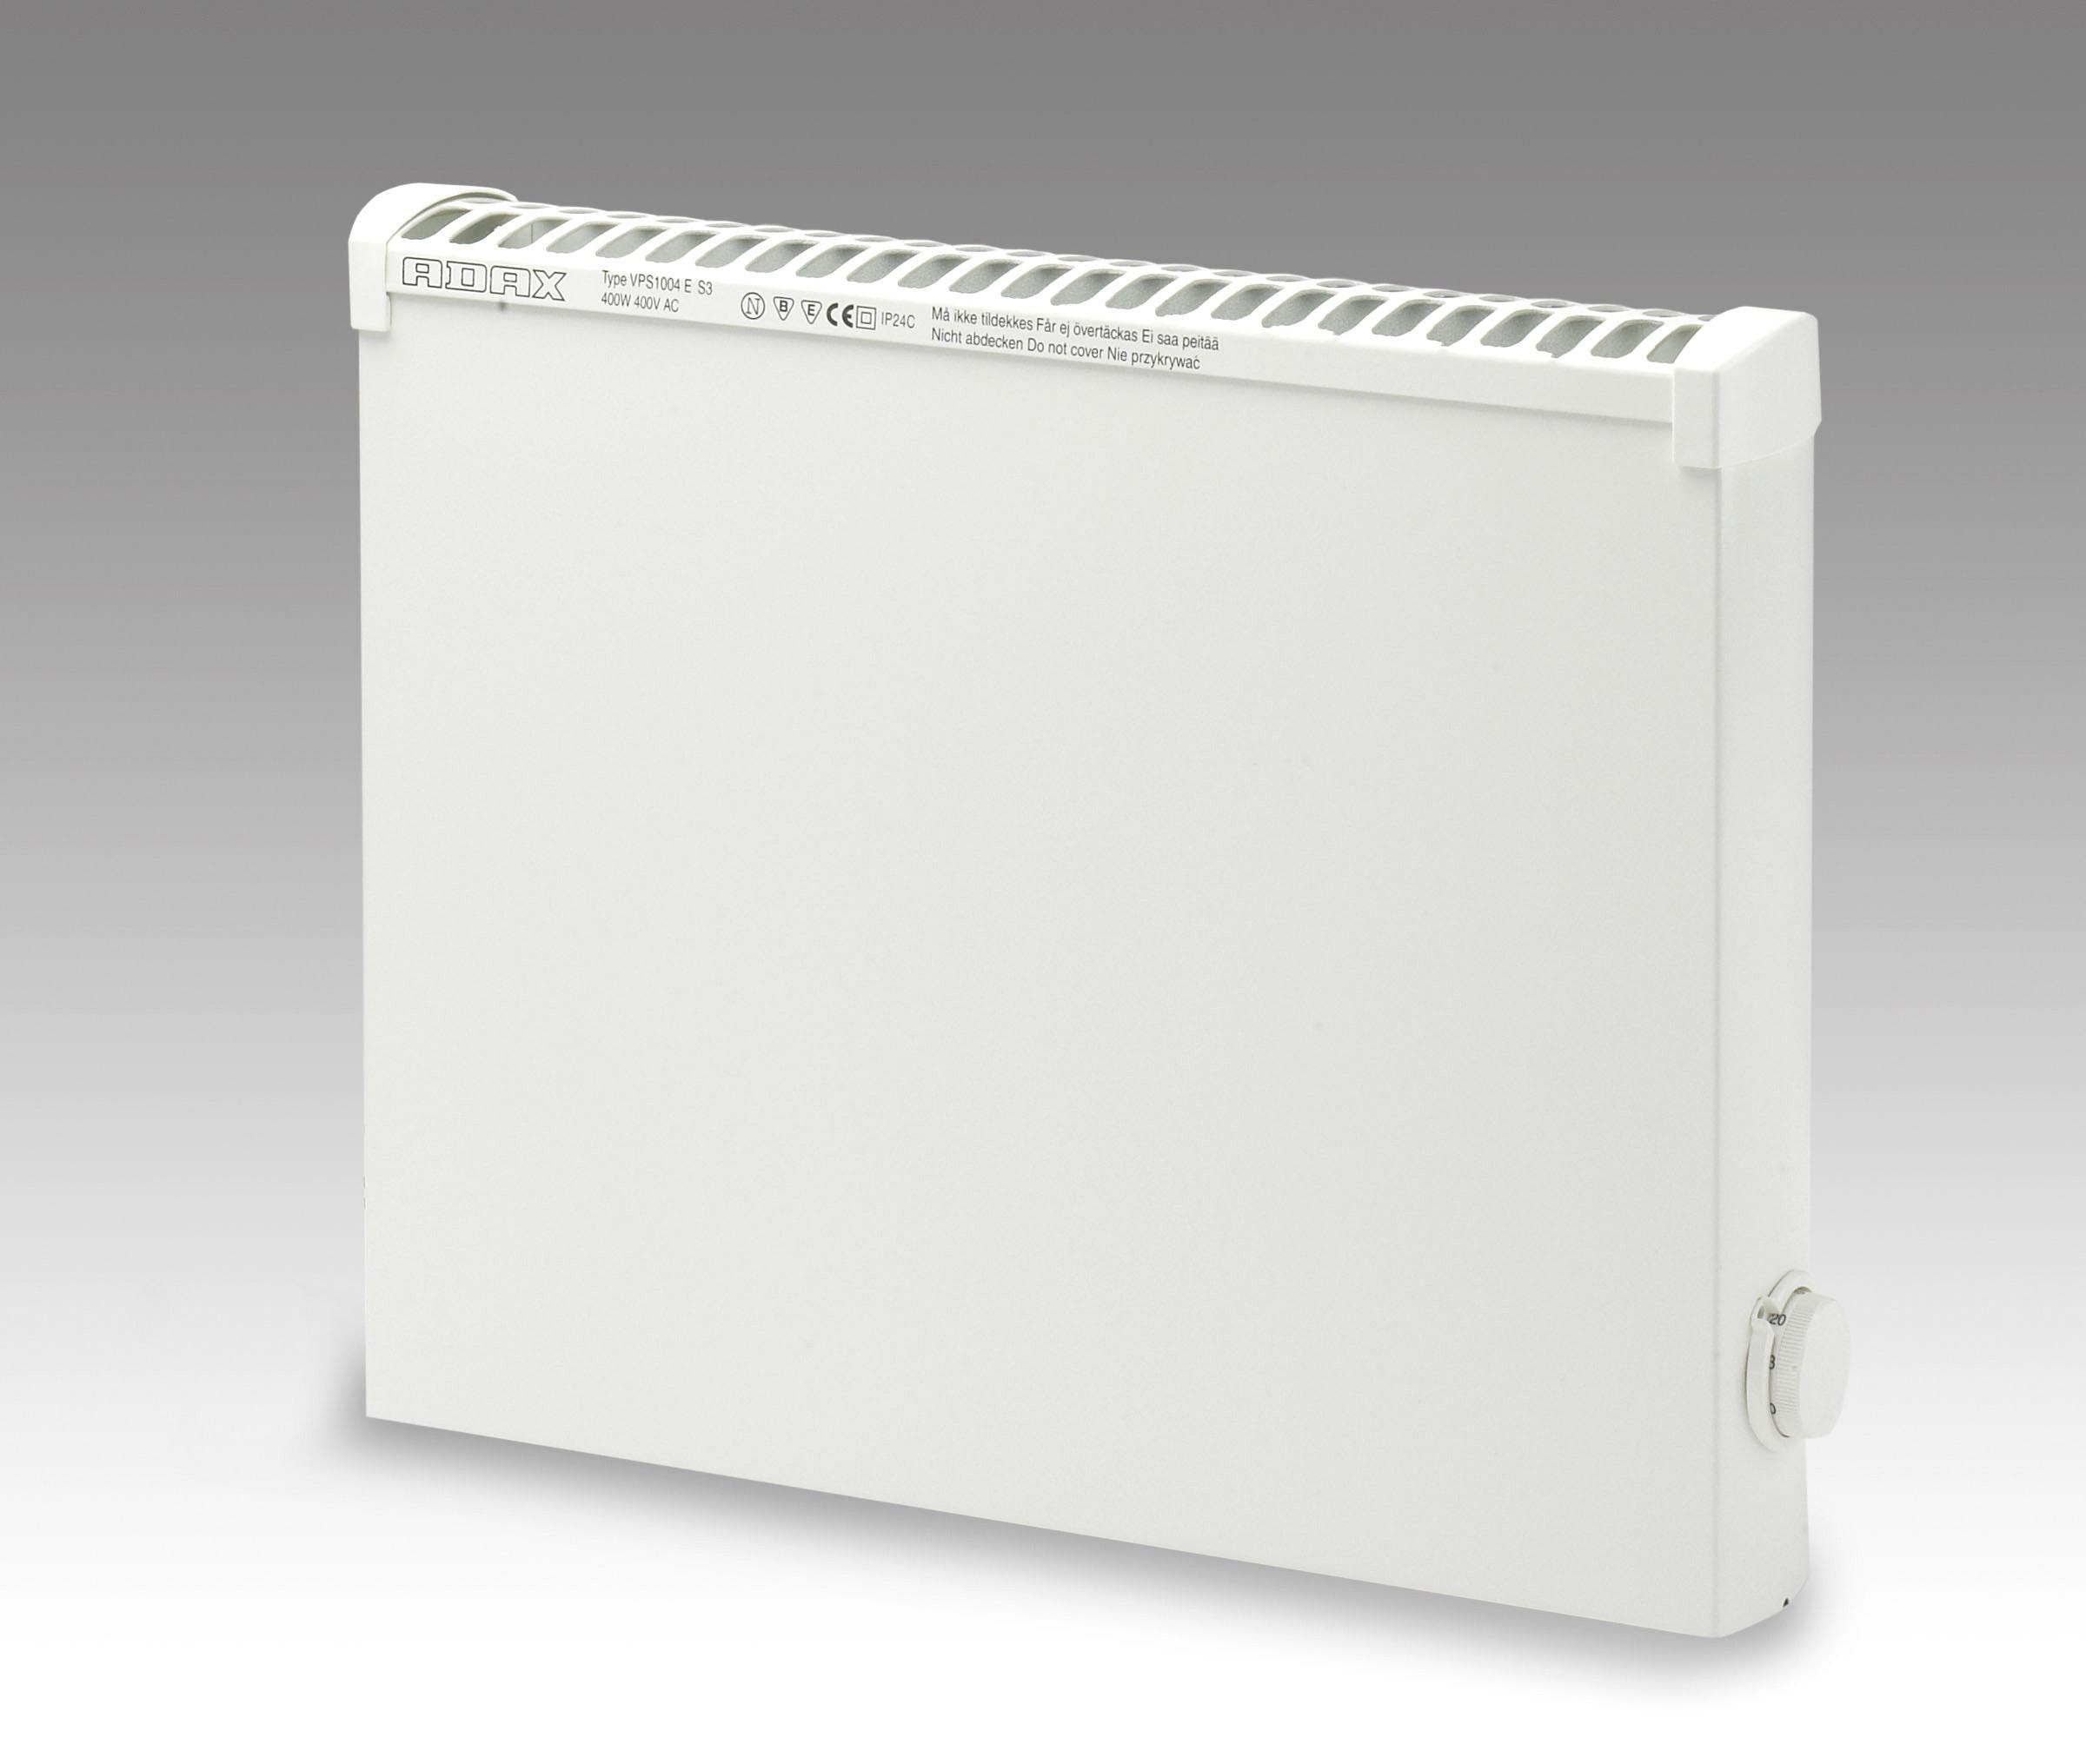 Våtrumselement Adax 782220 600W VPS1006/230V